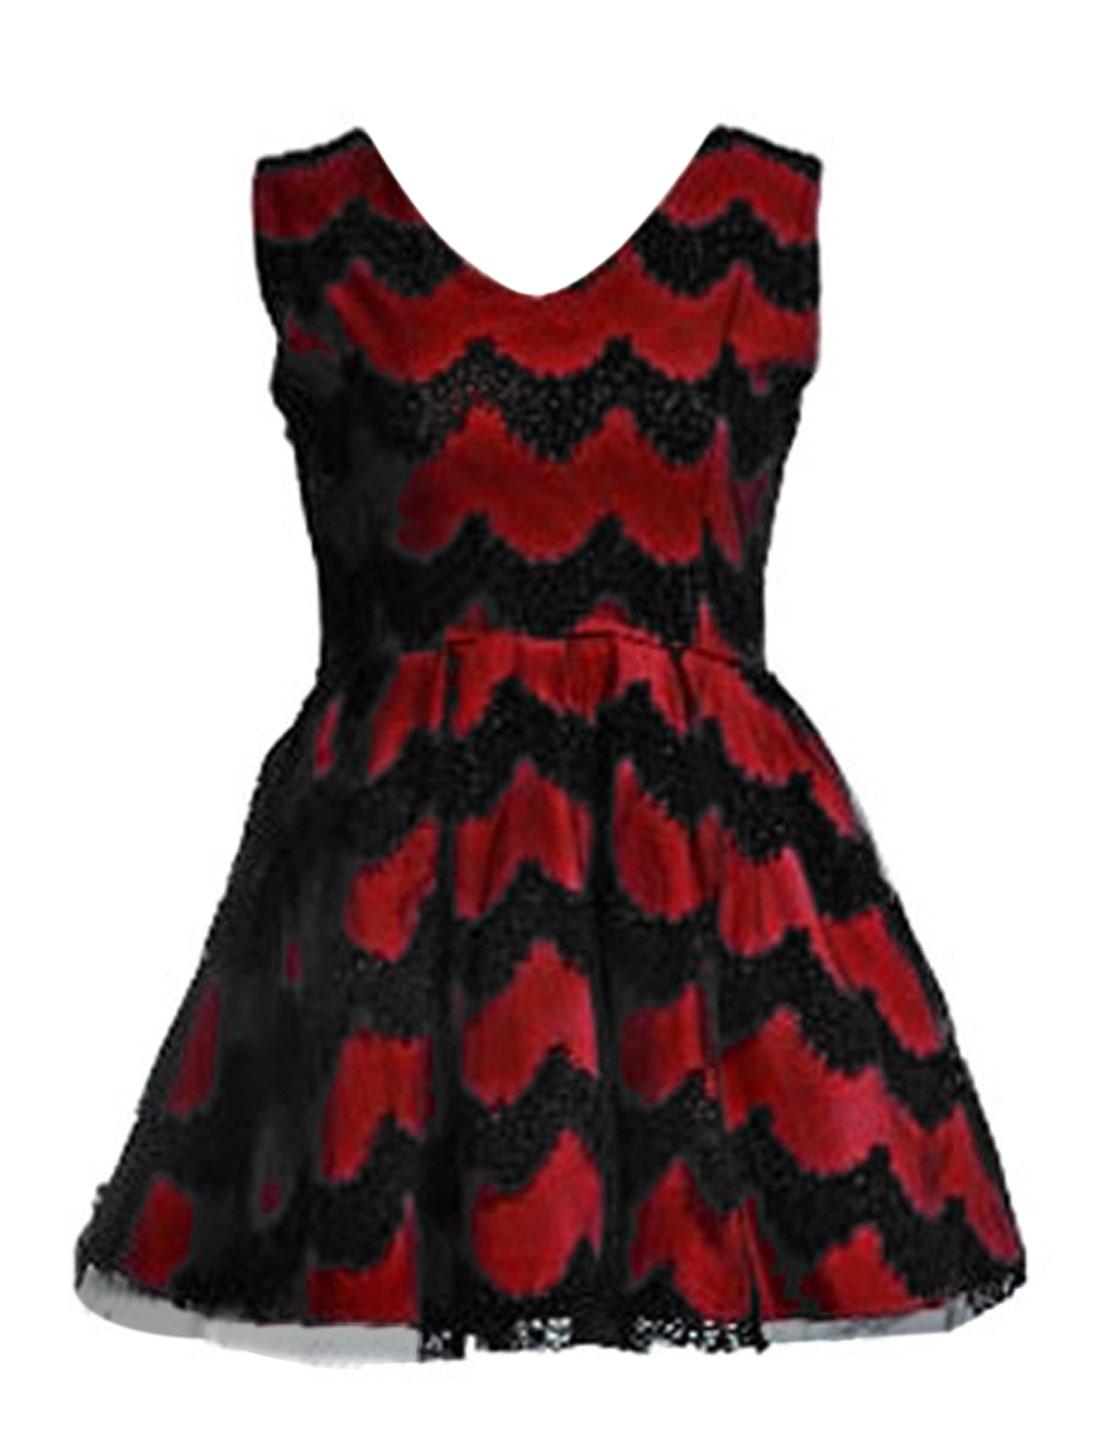 Women V Neck Zip Up Left Sleeveless Crochet Lace Dress Burgundy XS